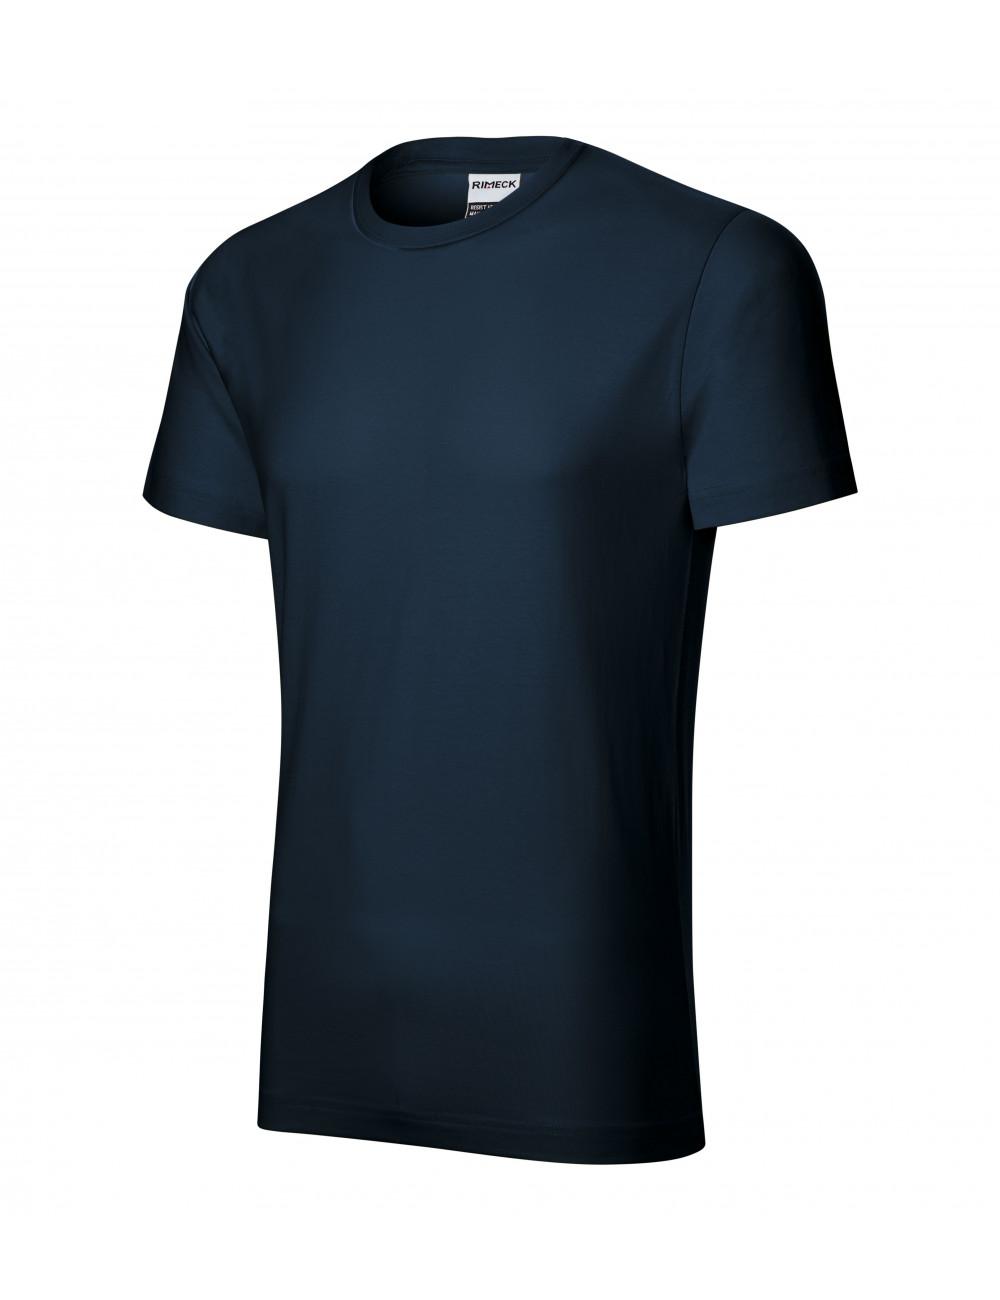 Adler RIMECK Koszulka męska Resist R01 granatowy